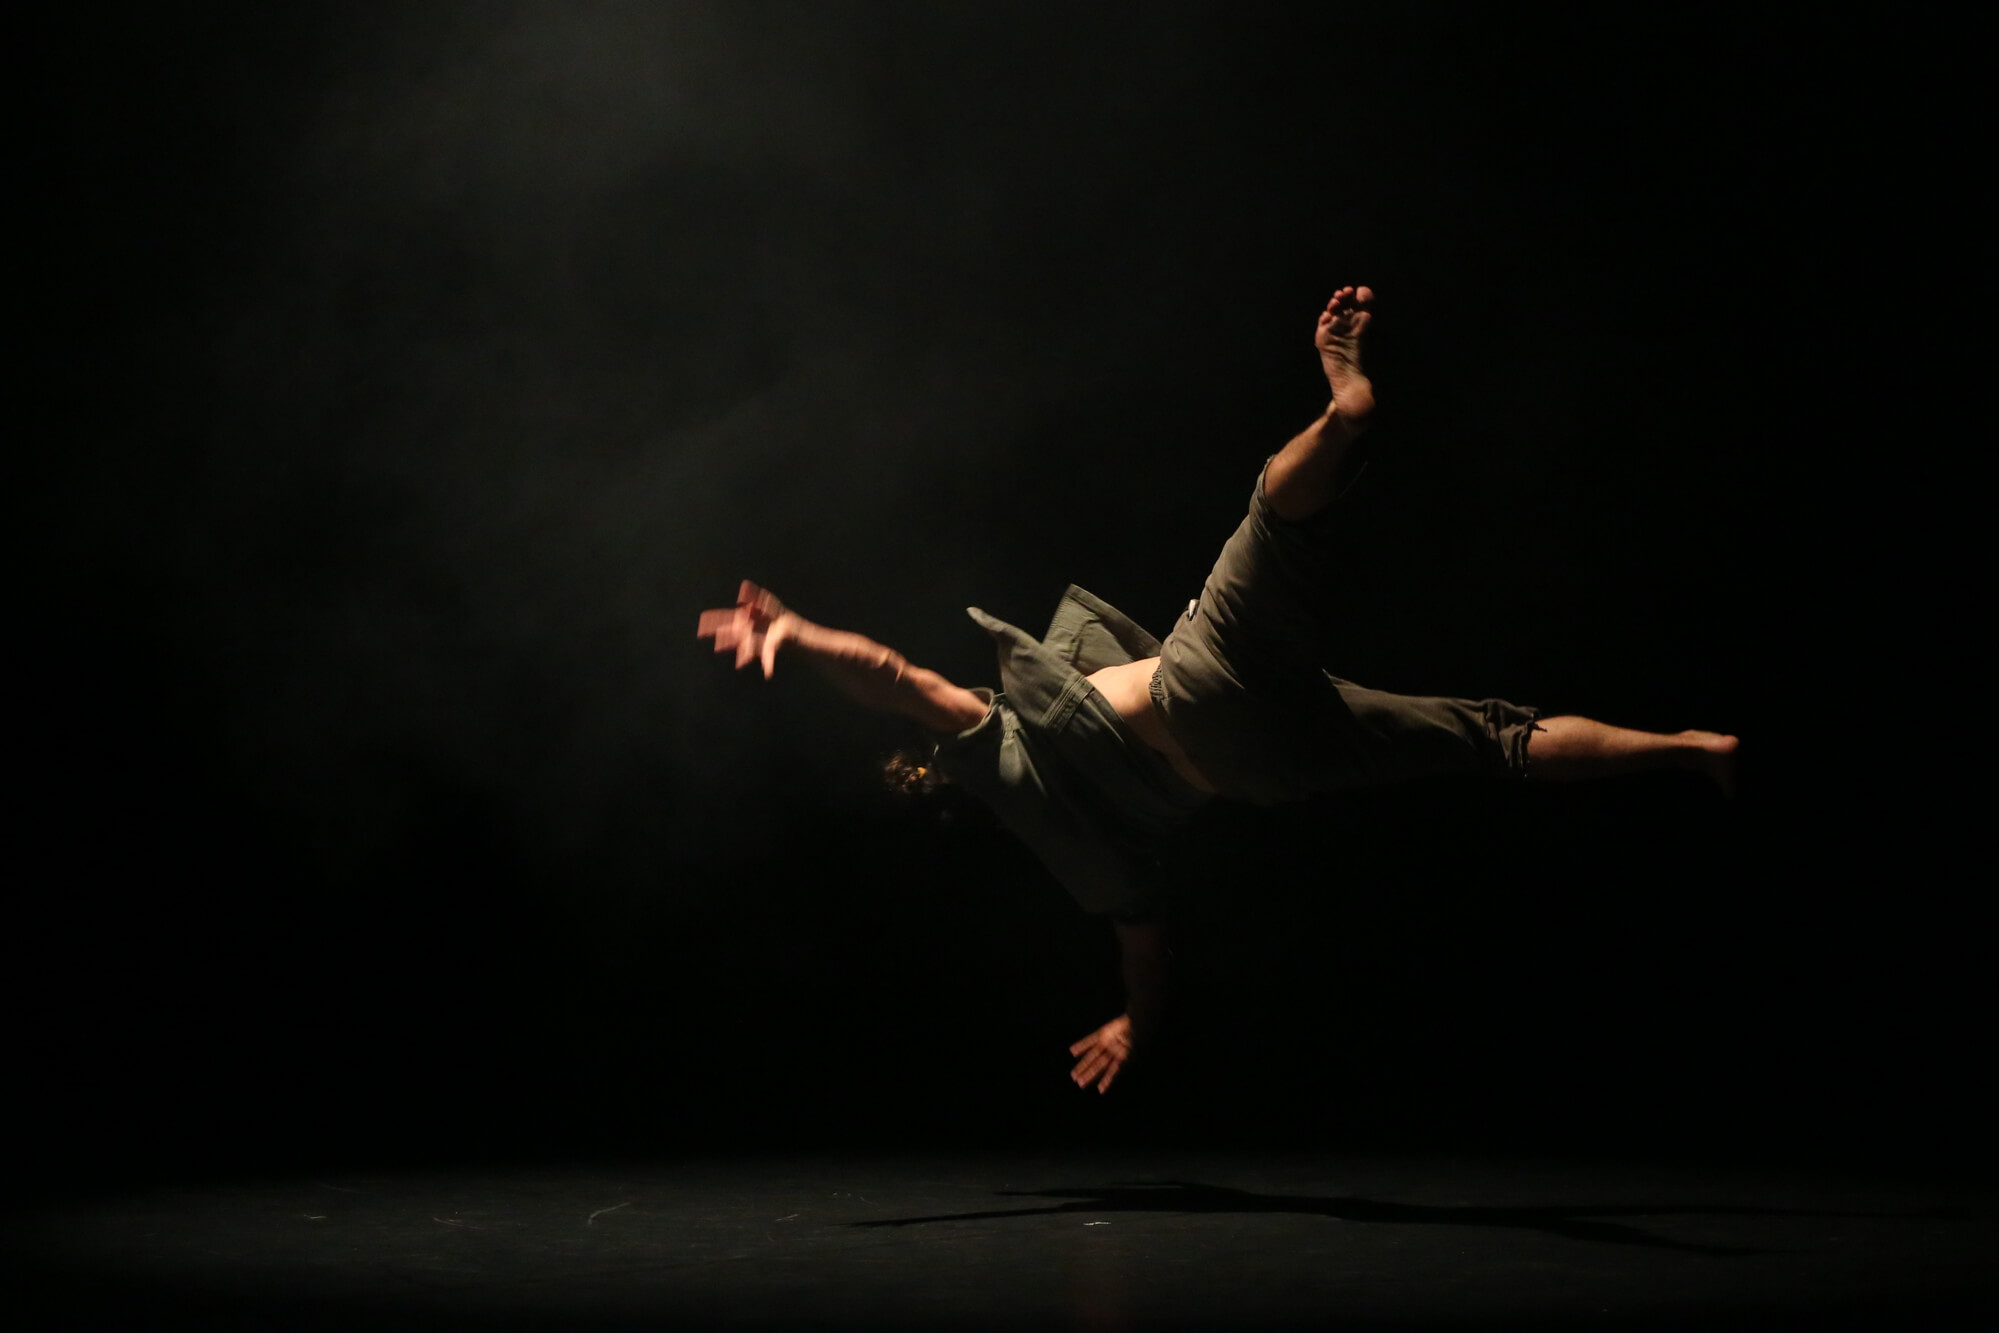 Pomurje Region - Future dance